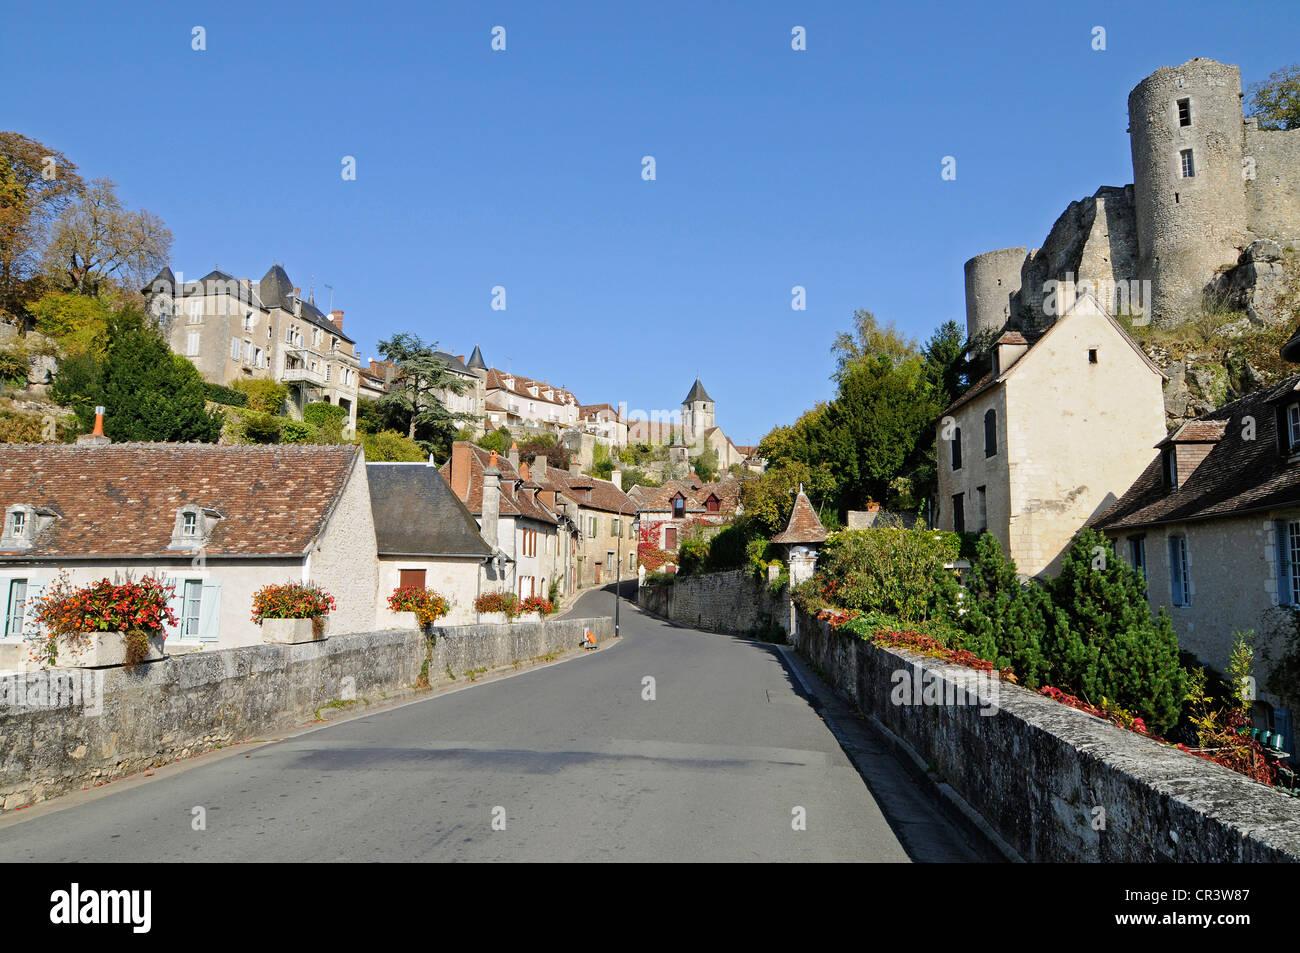 Angles sur l'Anglin, village, community, Poitiers, Vienne, Poitou-Charentes, France, Europe, PublicGround - Stock Image